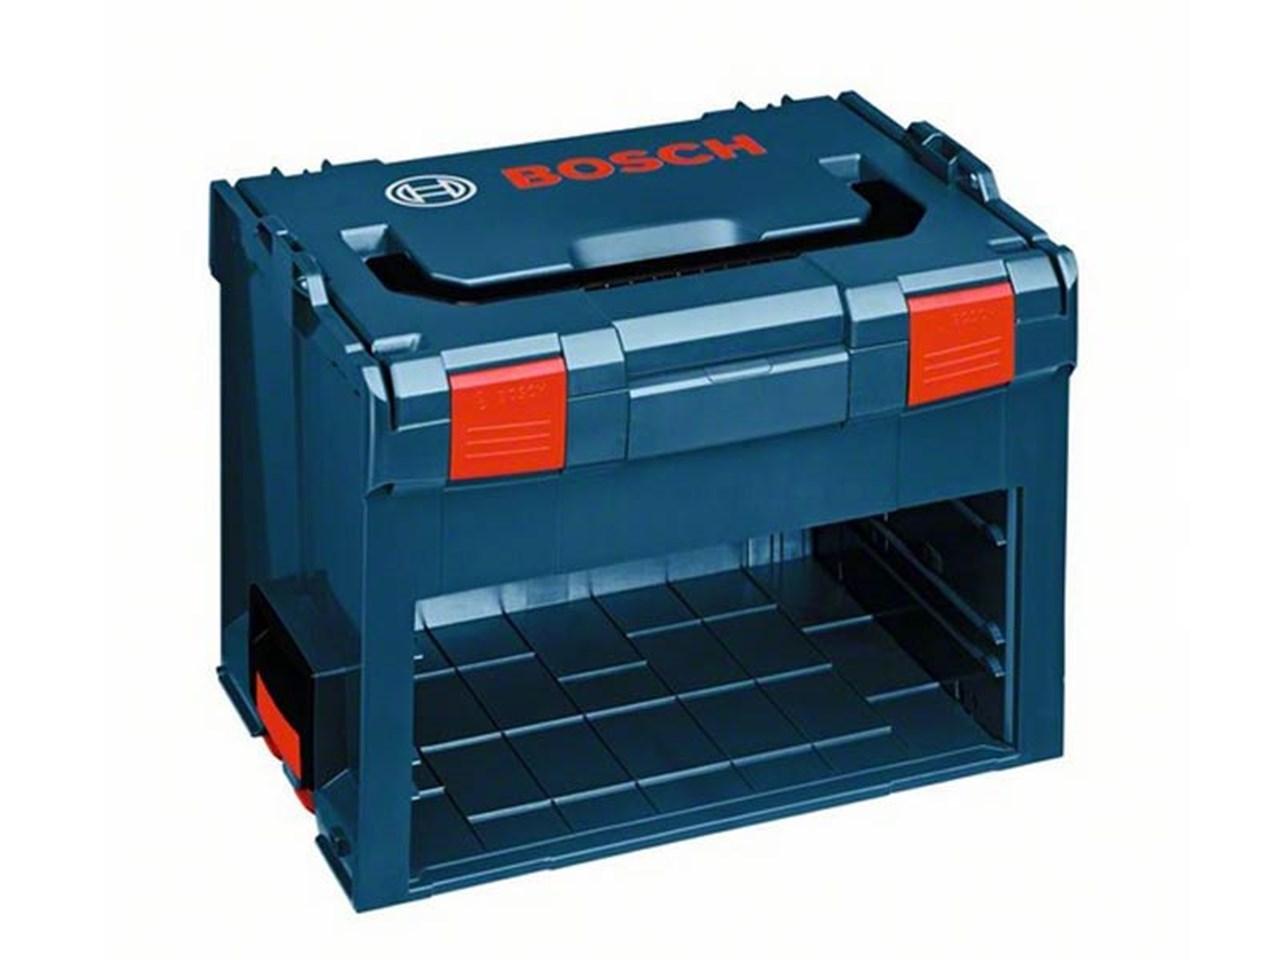 bosch ls boxx 306 storage case. Black Bedroom Furniture Sets. Home Design Ideas